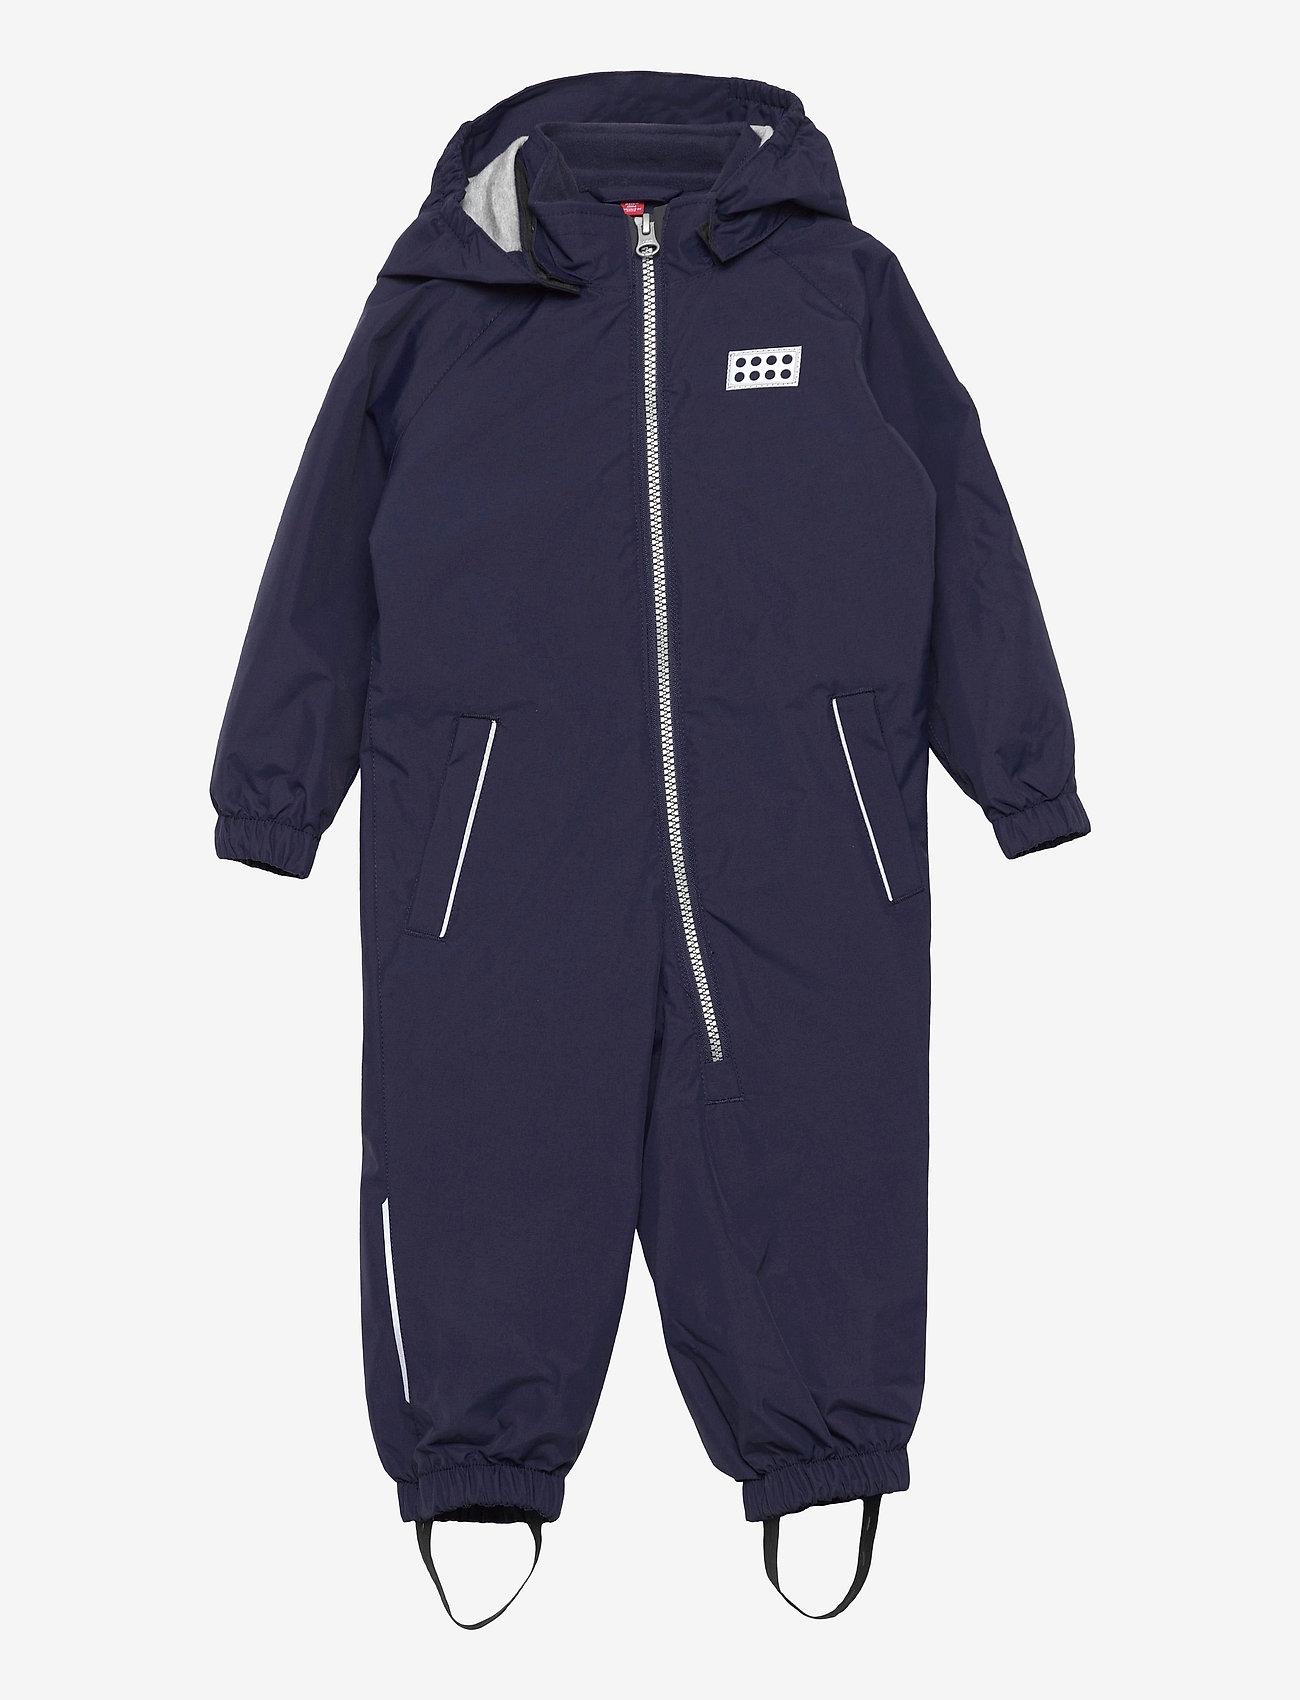 Lego wear - LWJIVAN 202 - SUIT - shell clothing - dark navy - 0